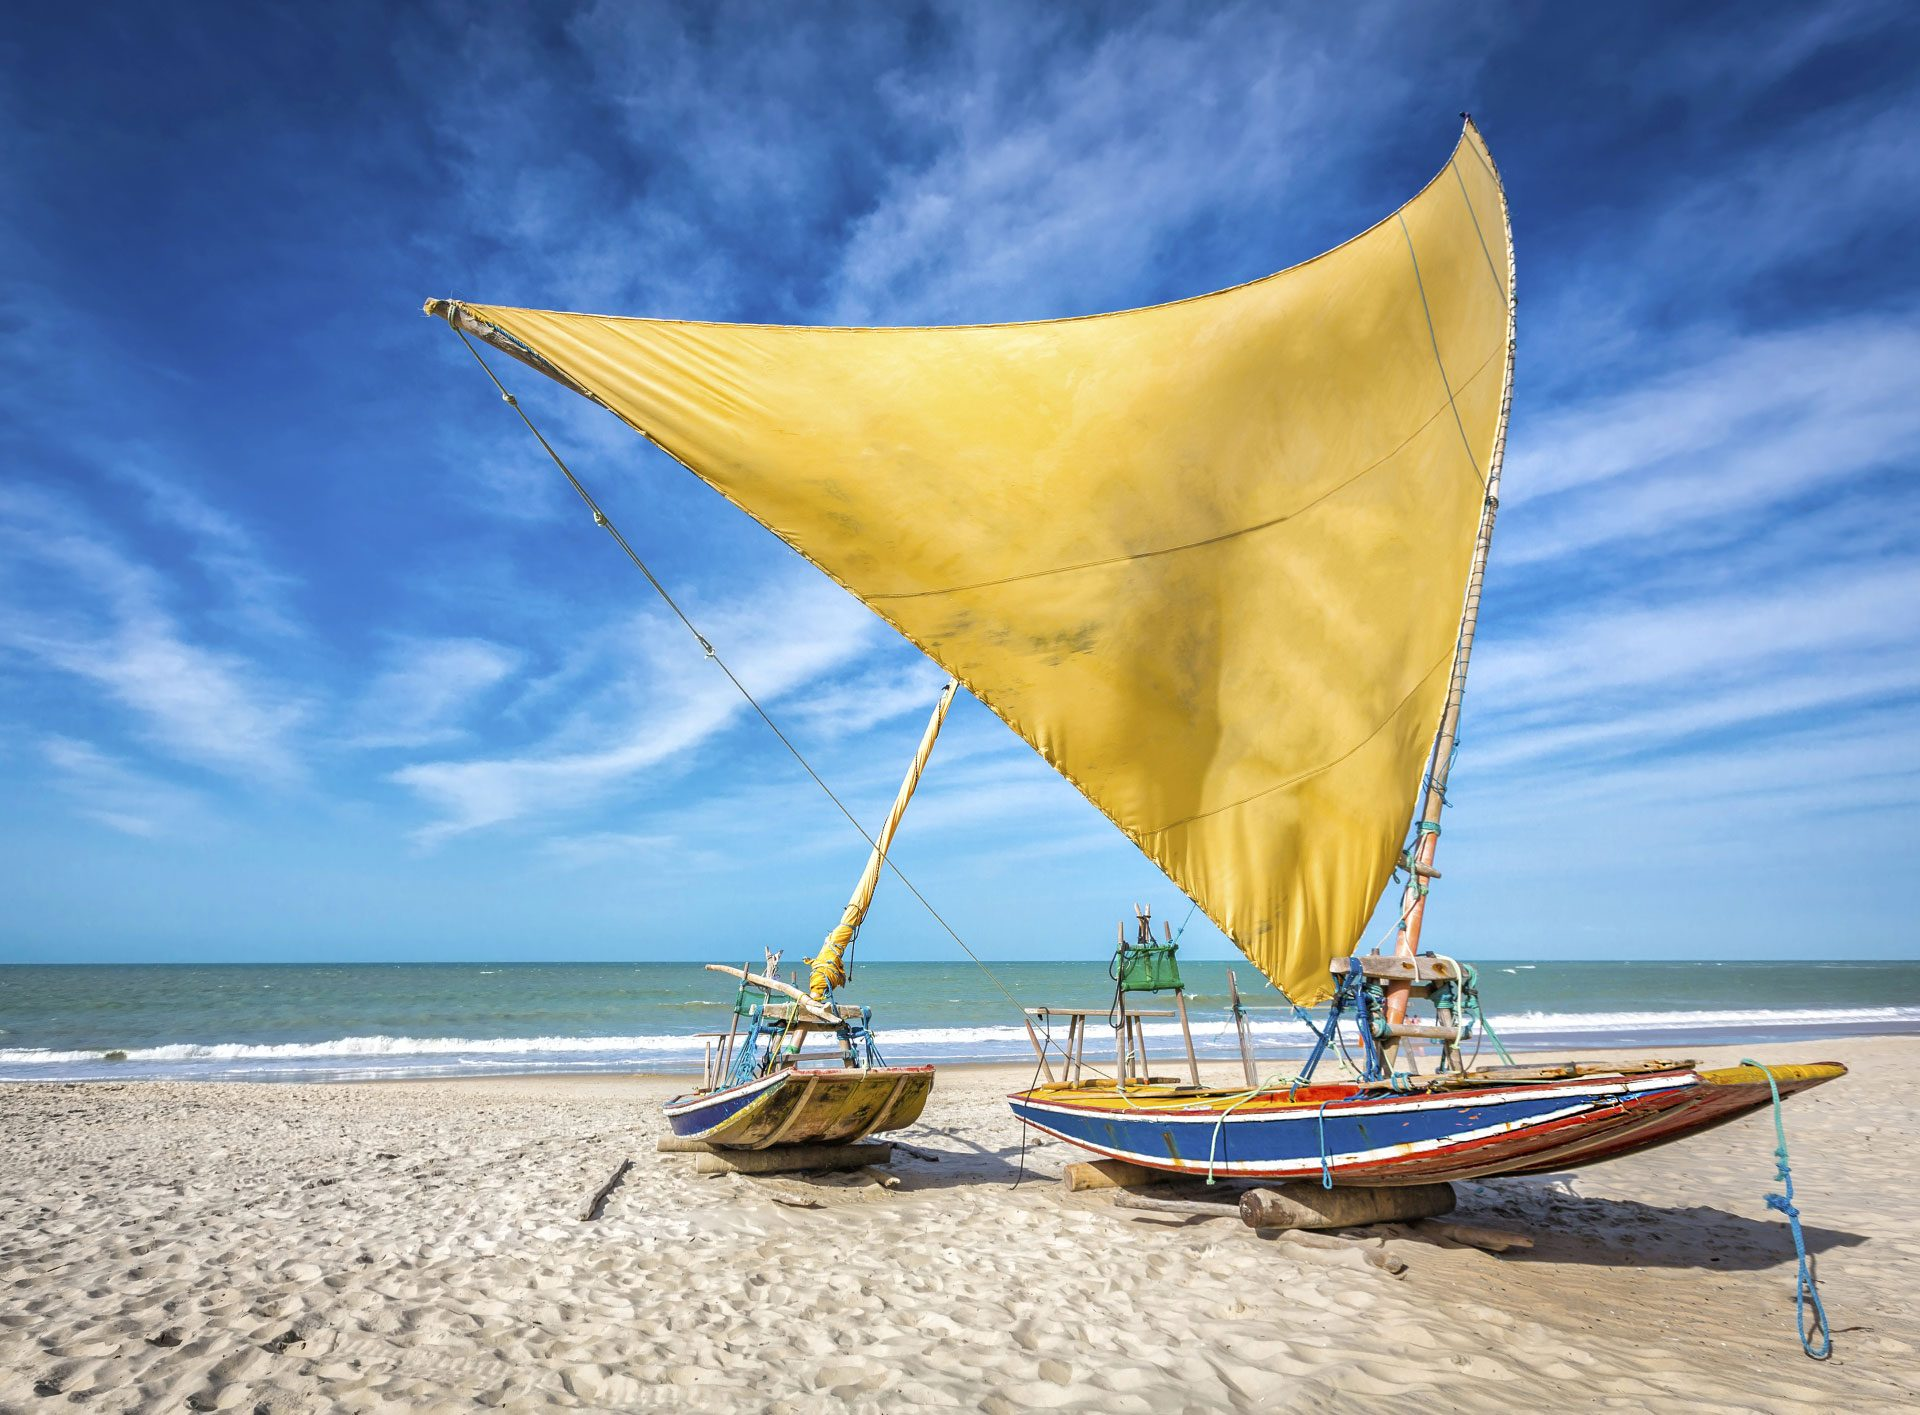 Catch a Sail at Regata da Jangadas